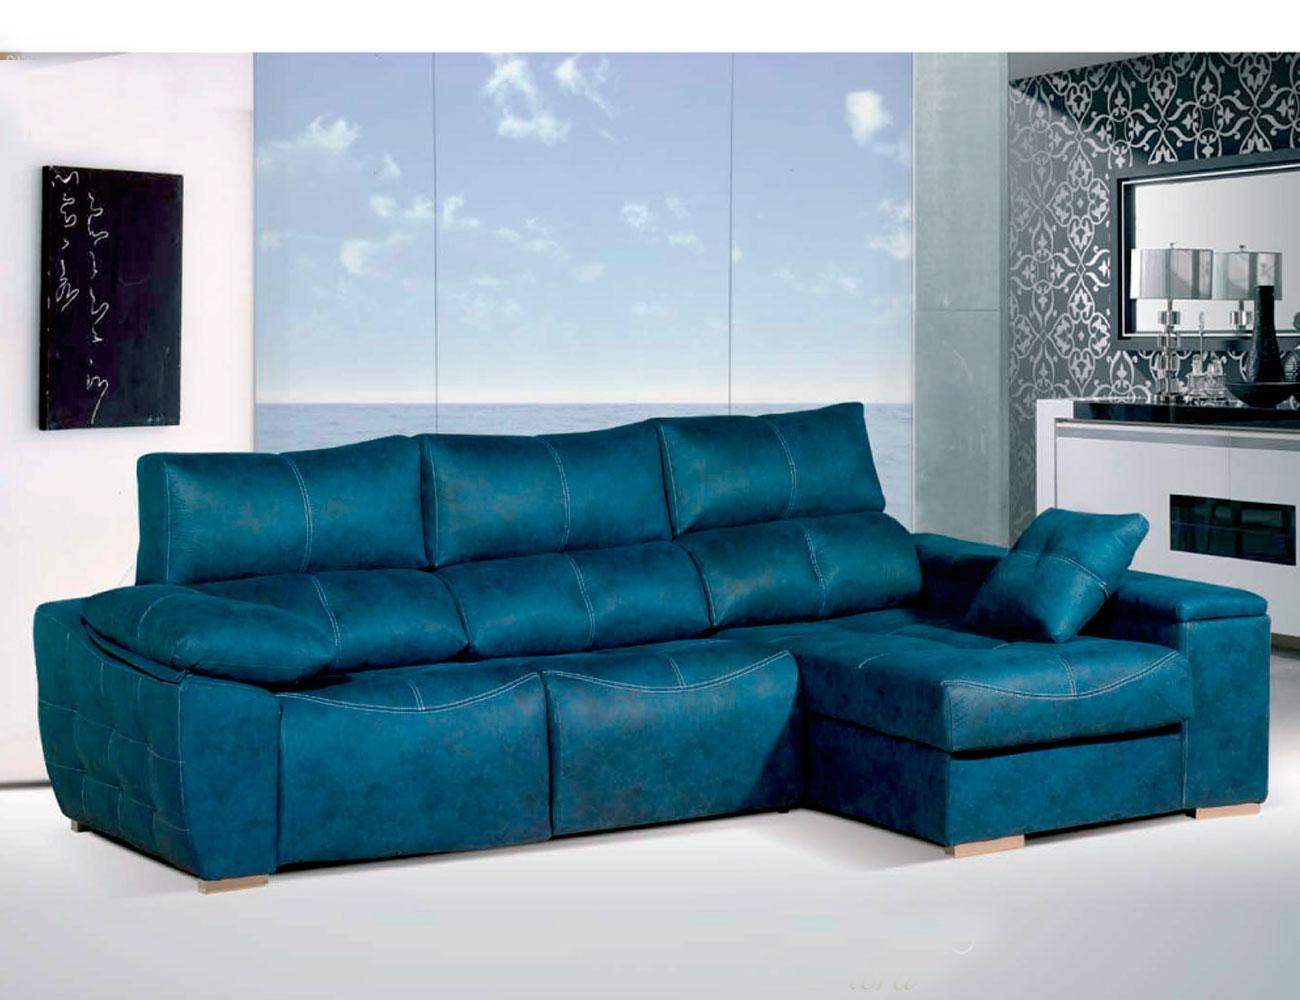 Sofa chaiselongue relax 2 motores anti manchas turquesa30